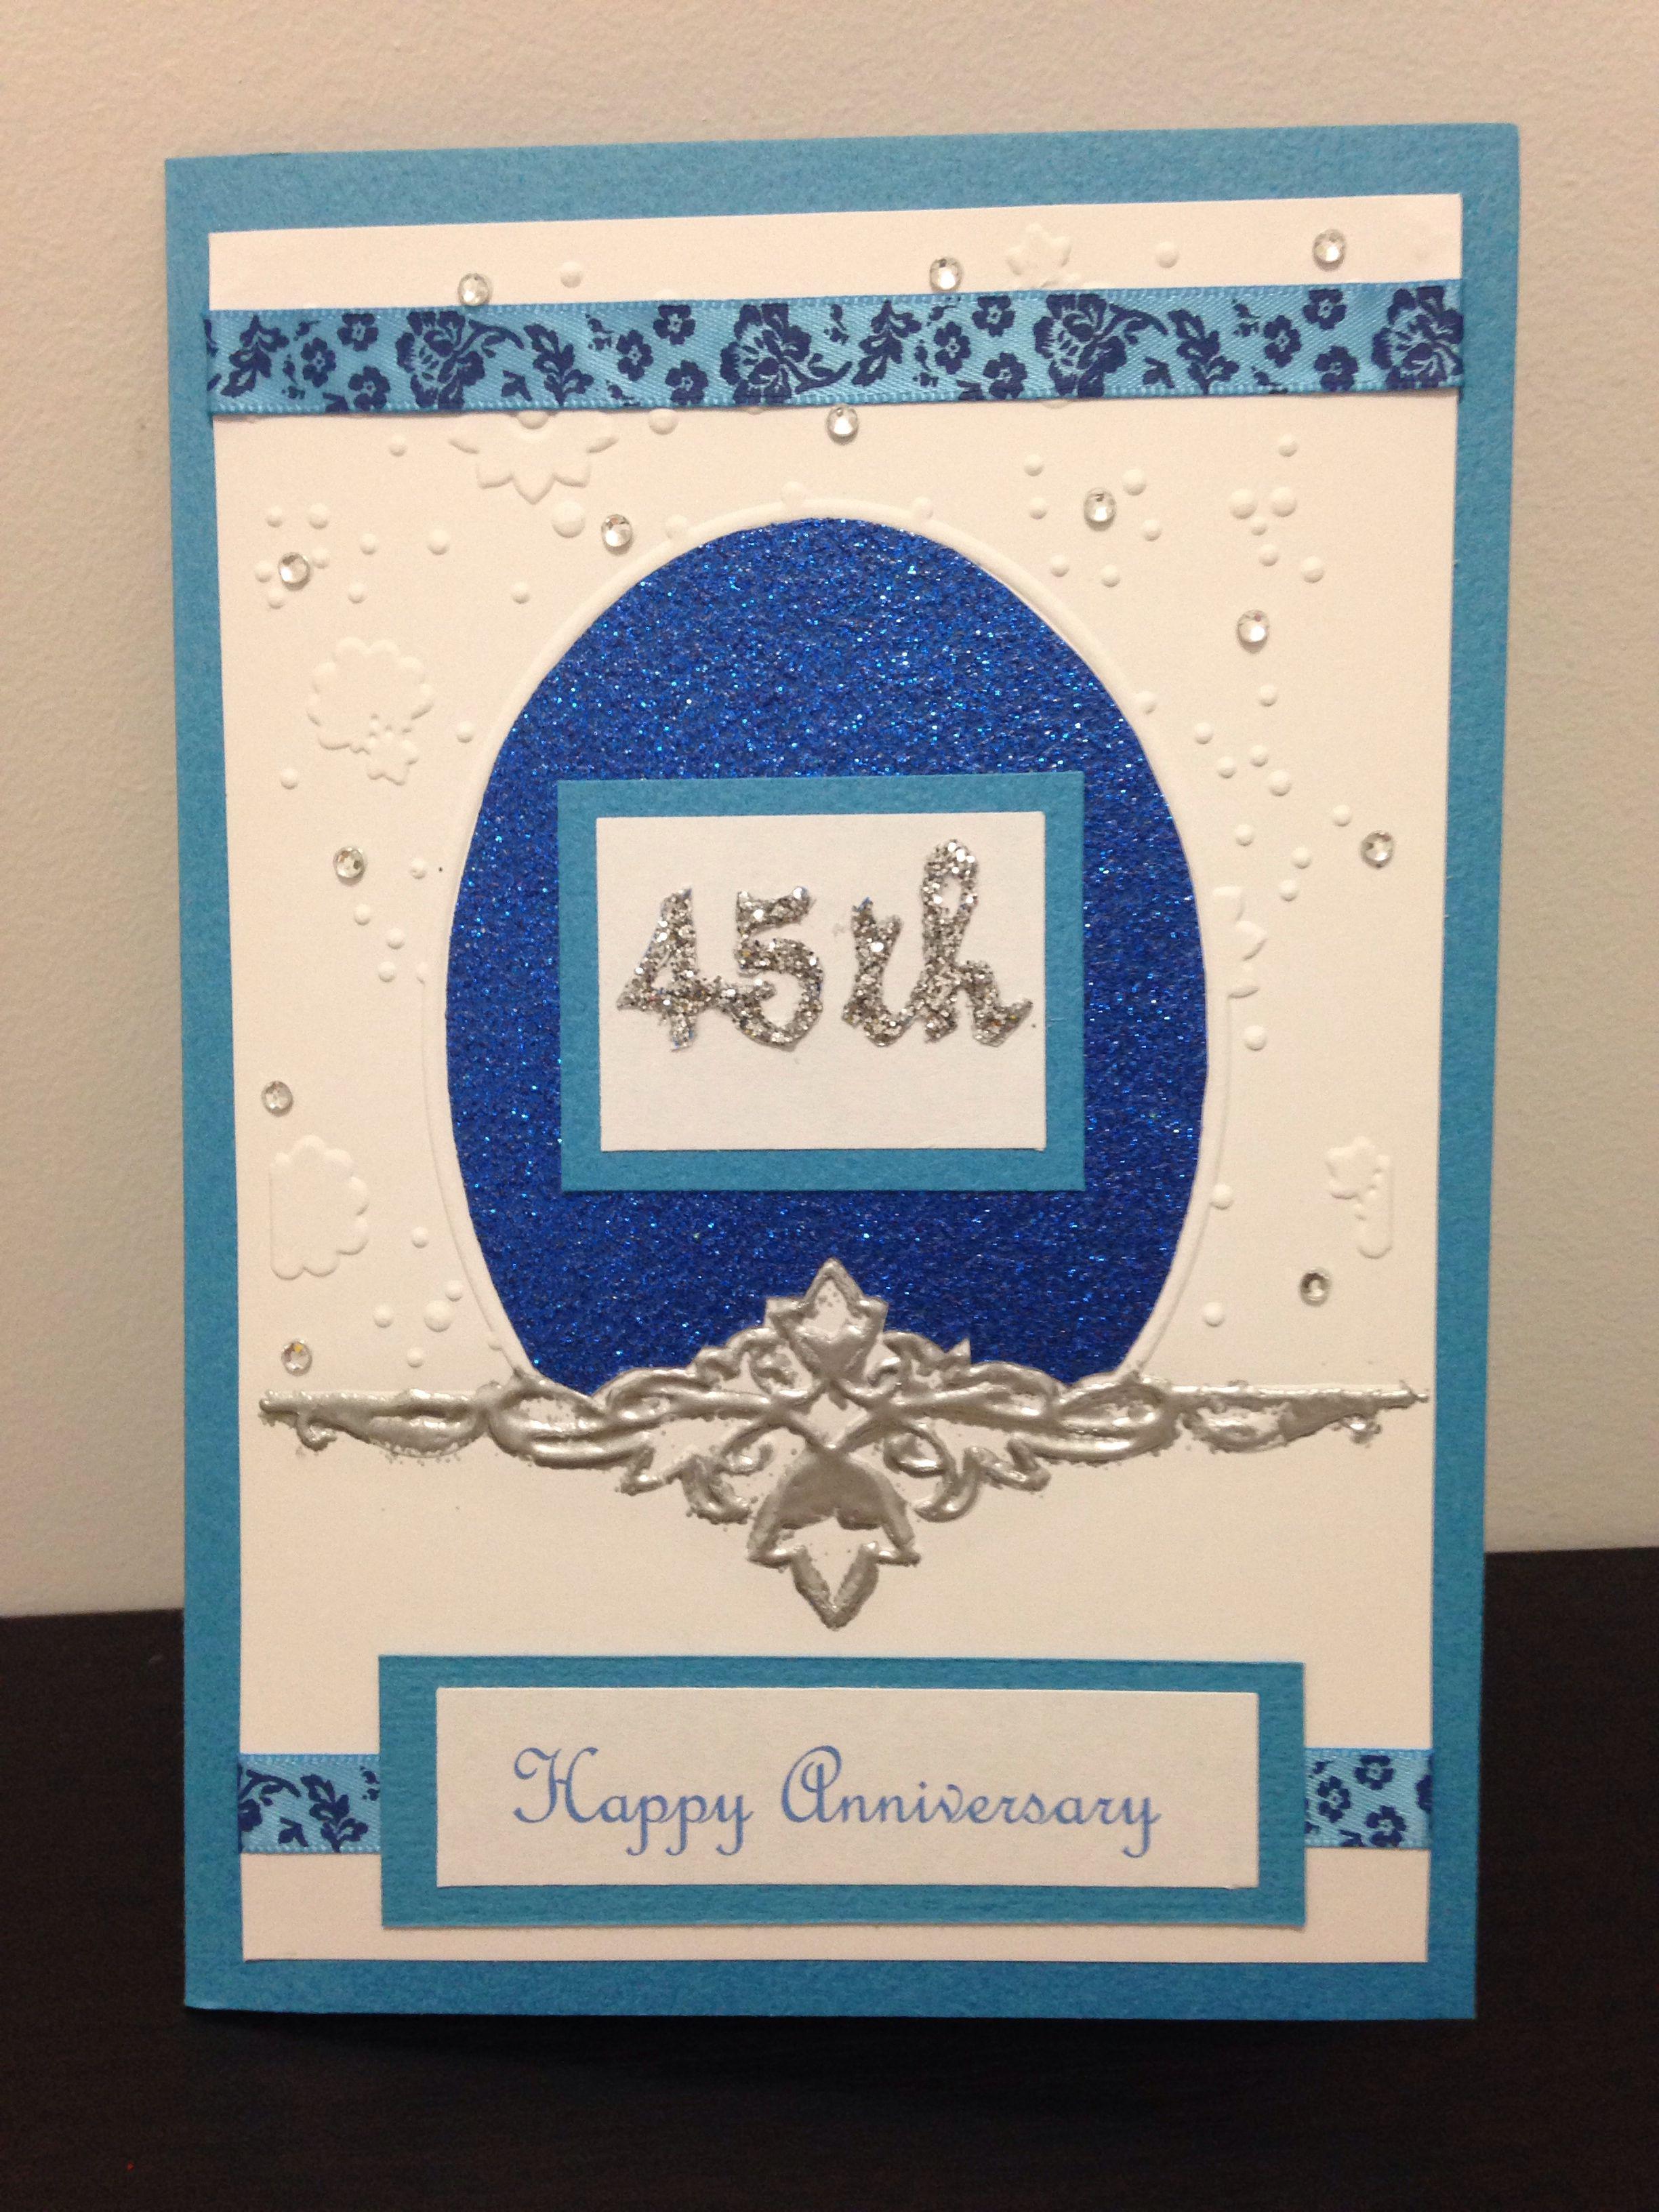 45th wedding anniversary card Anniversary cards, Happy